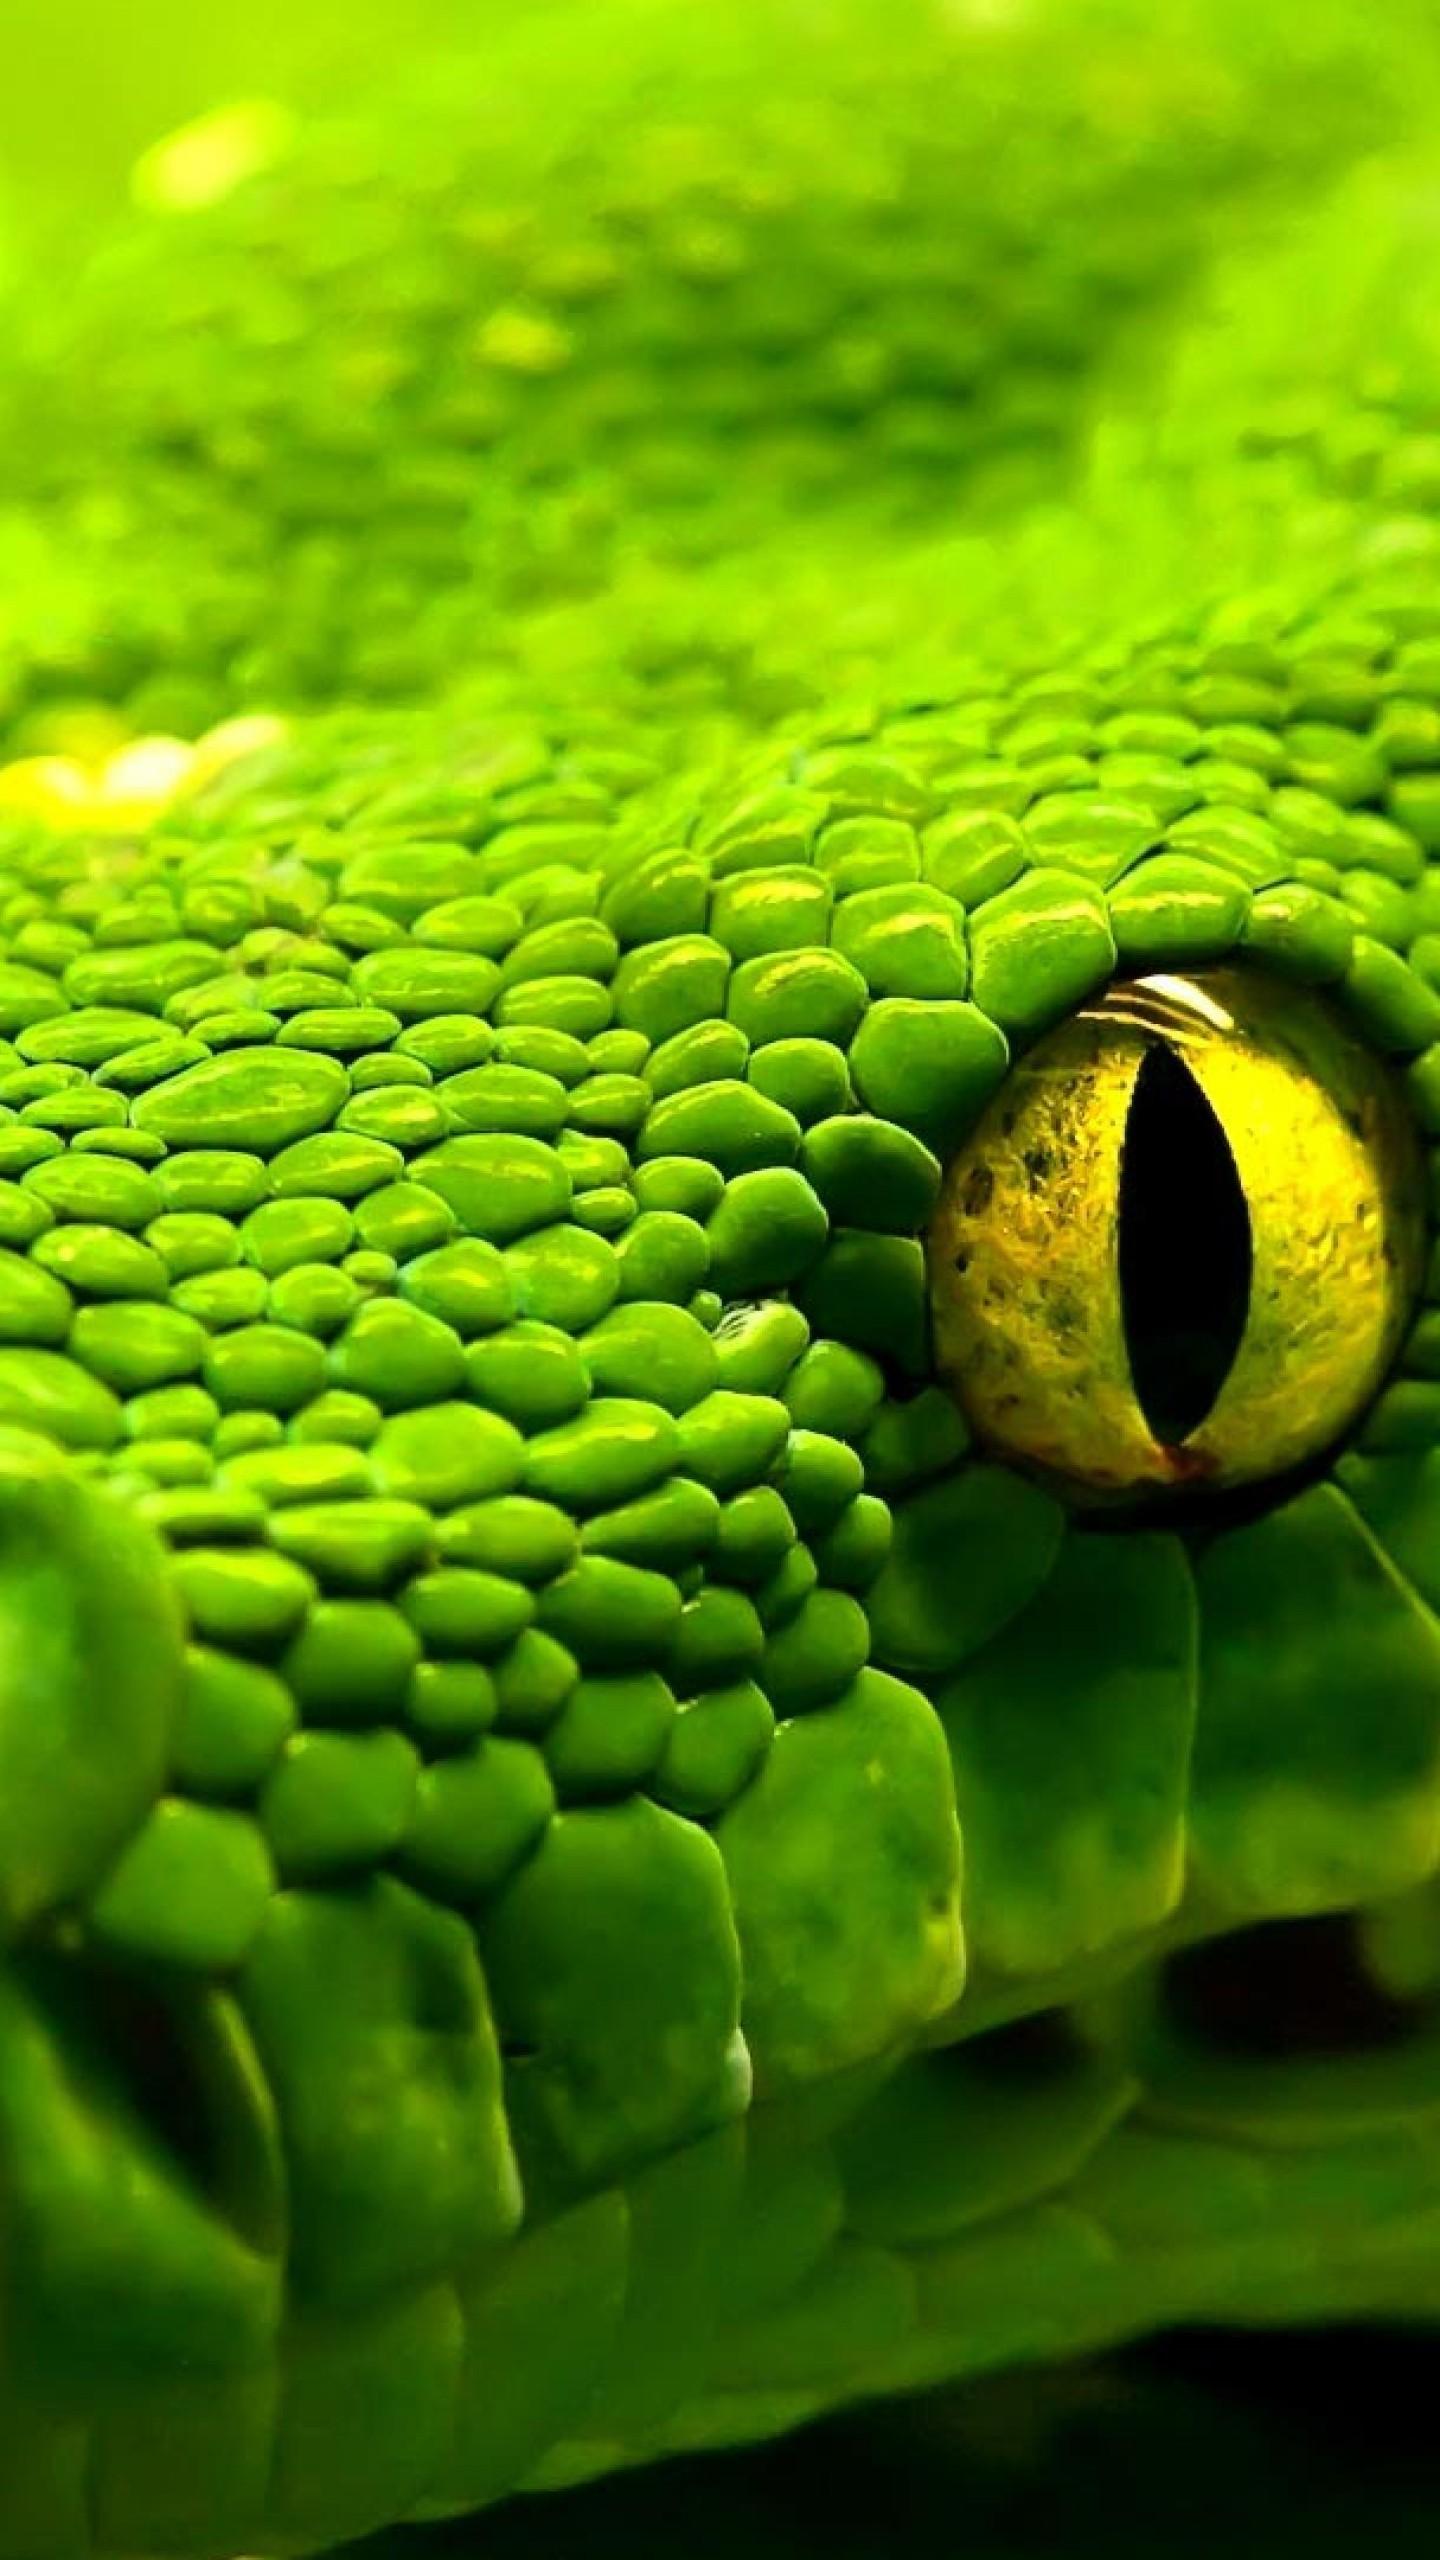 Hd 3d Snake Wallpapers Wallpaper Snake Green Reptile Eyes Animals 713